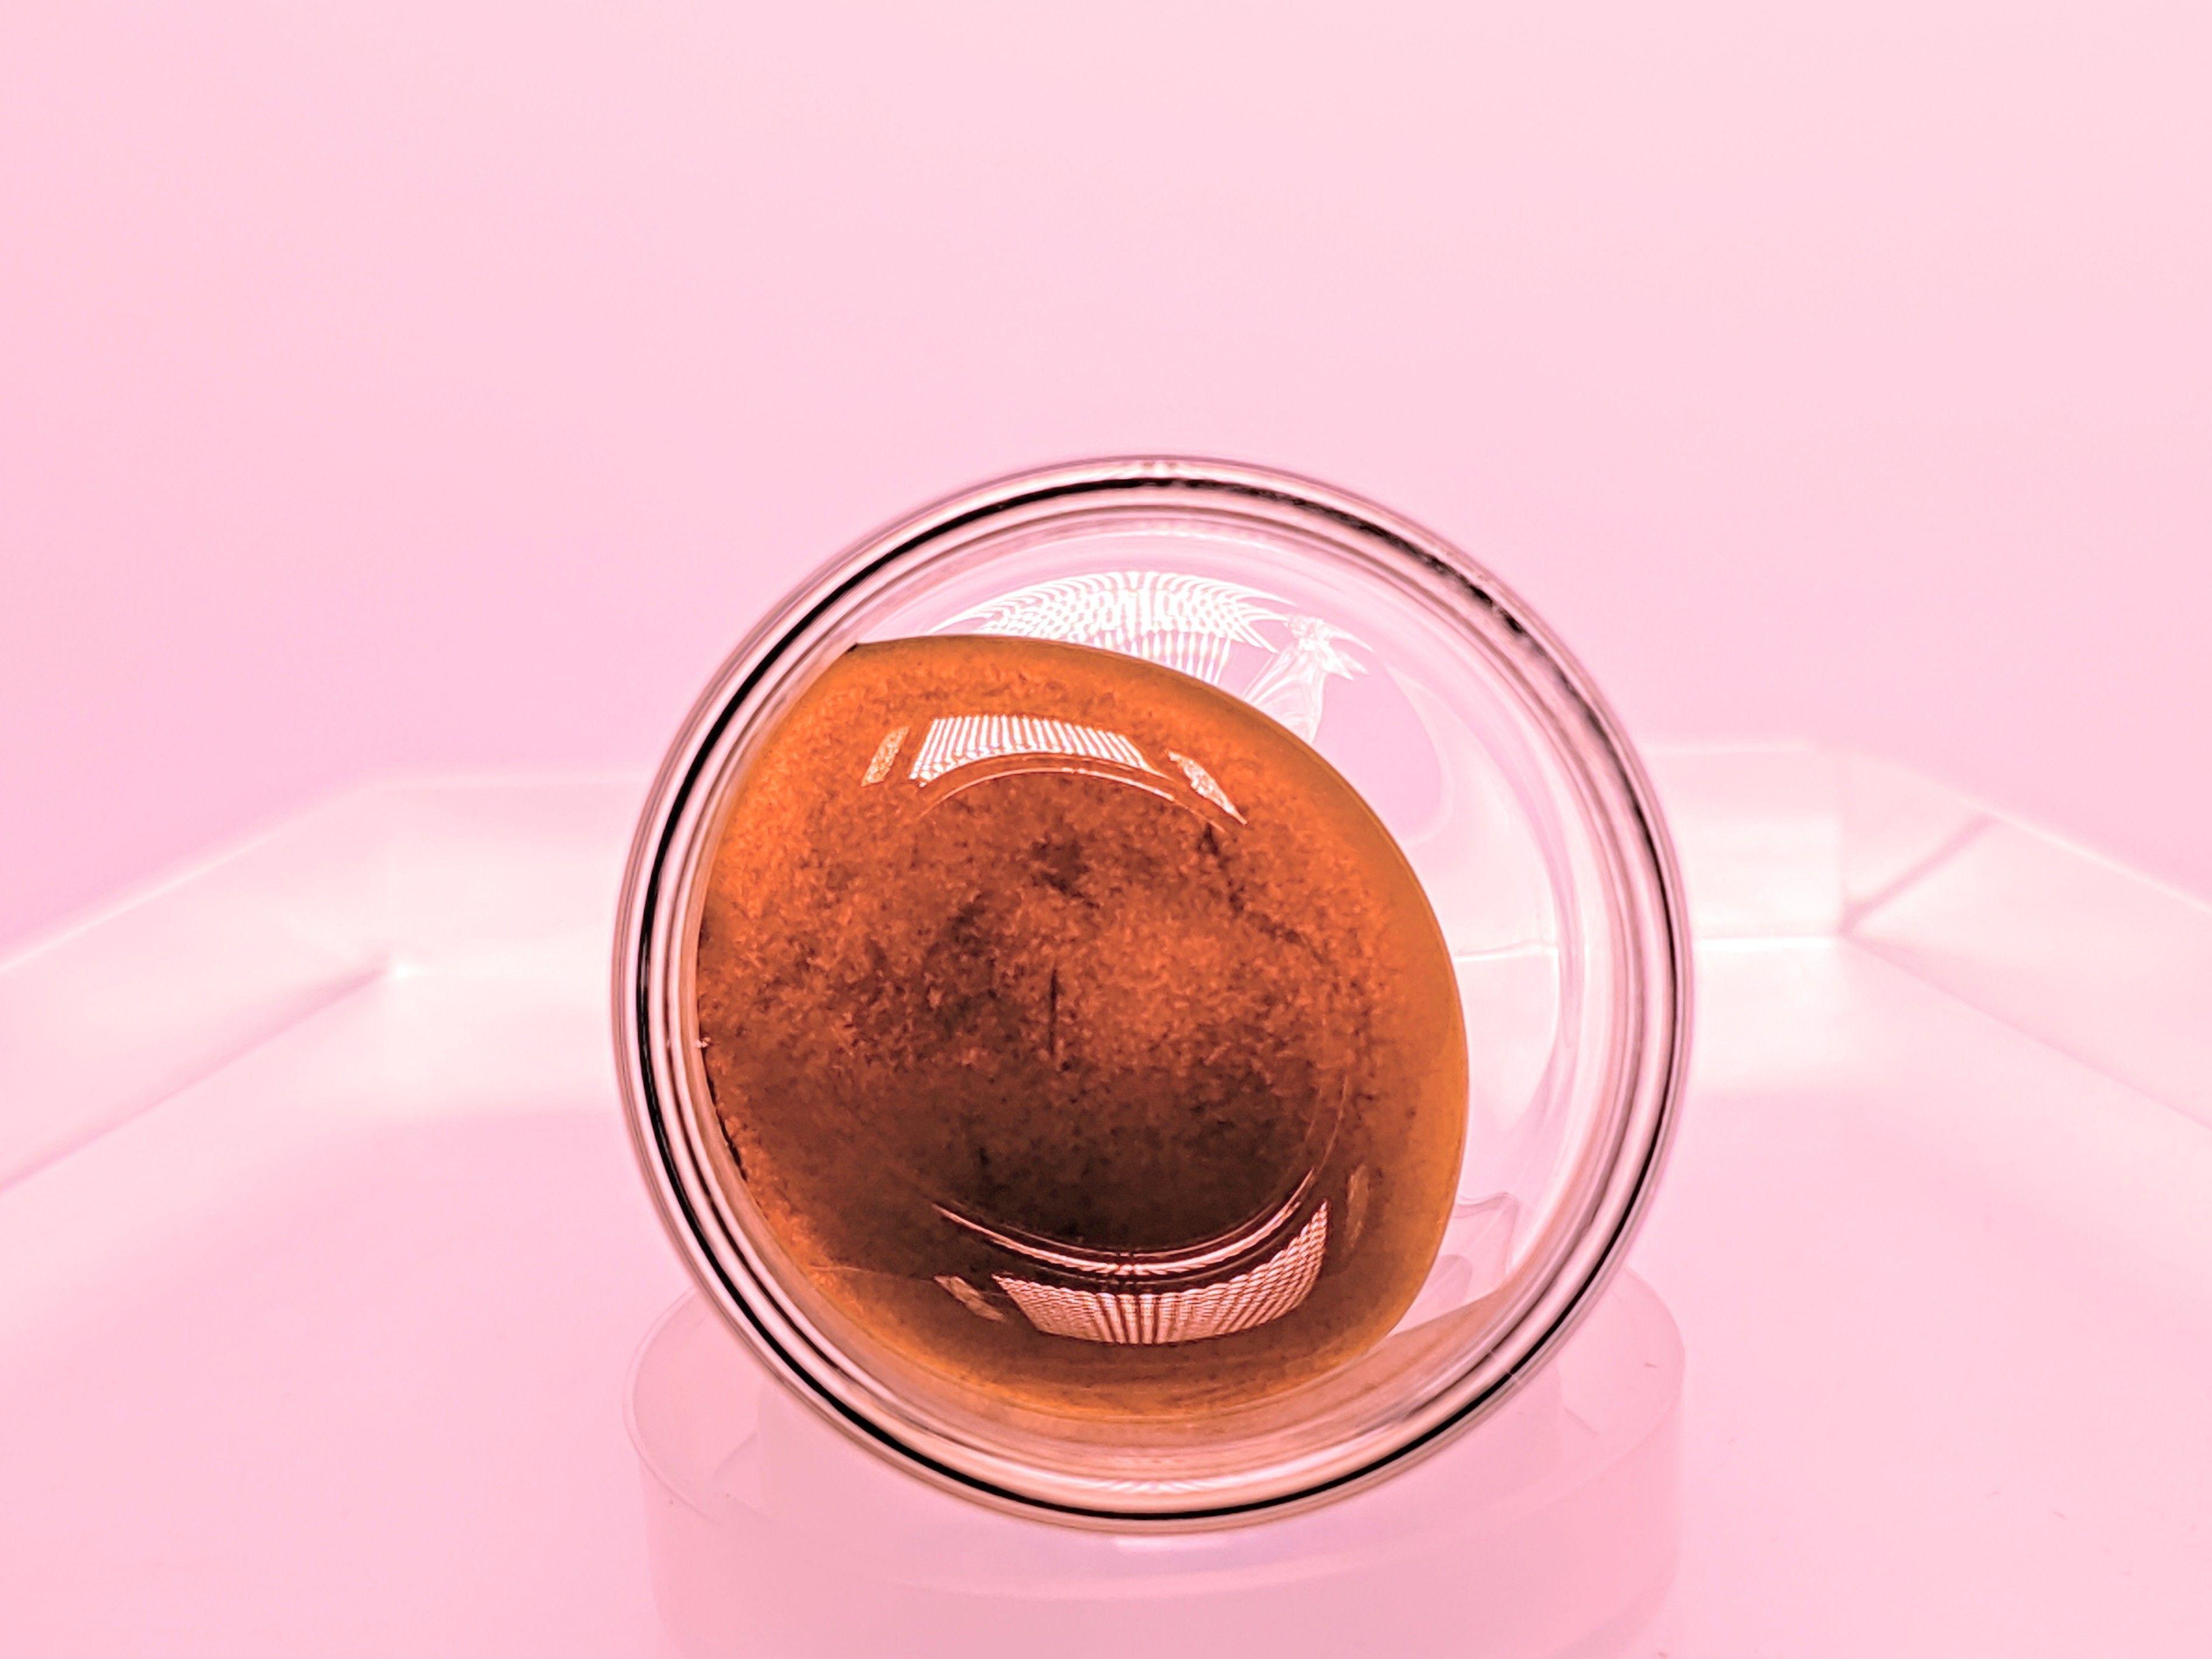 Tree Honey - Purple Punch, Indica Hybrid, Pull-n-snap